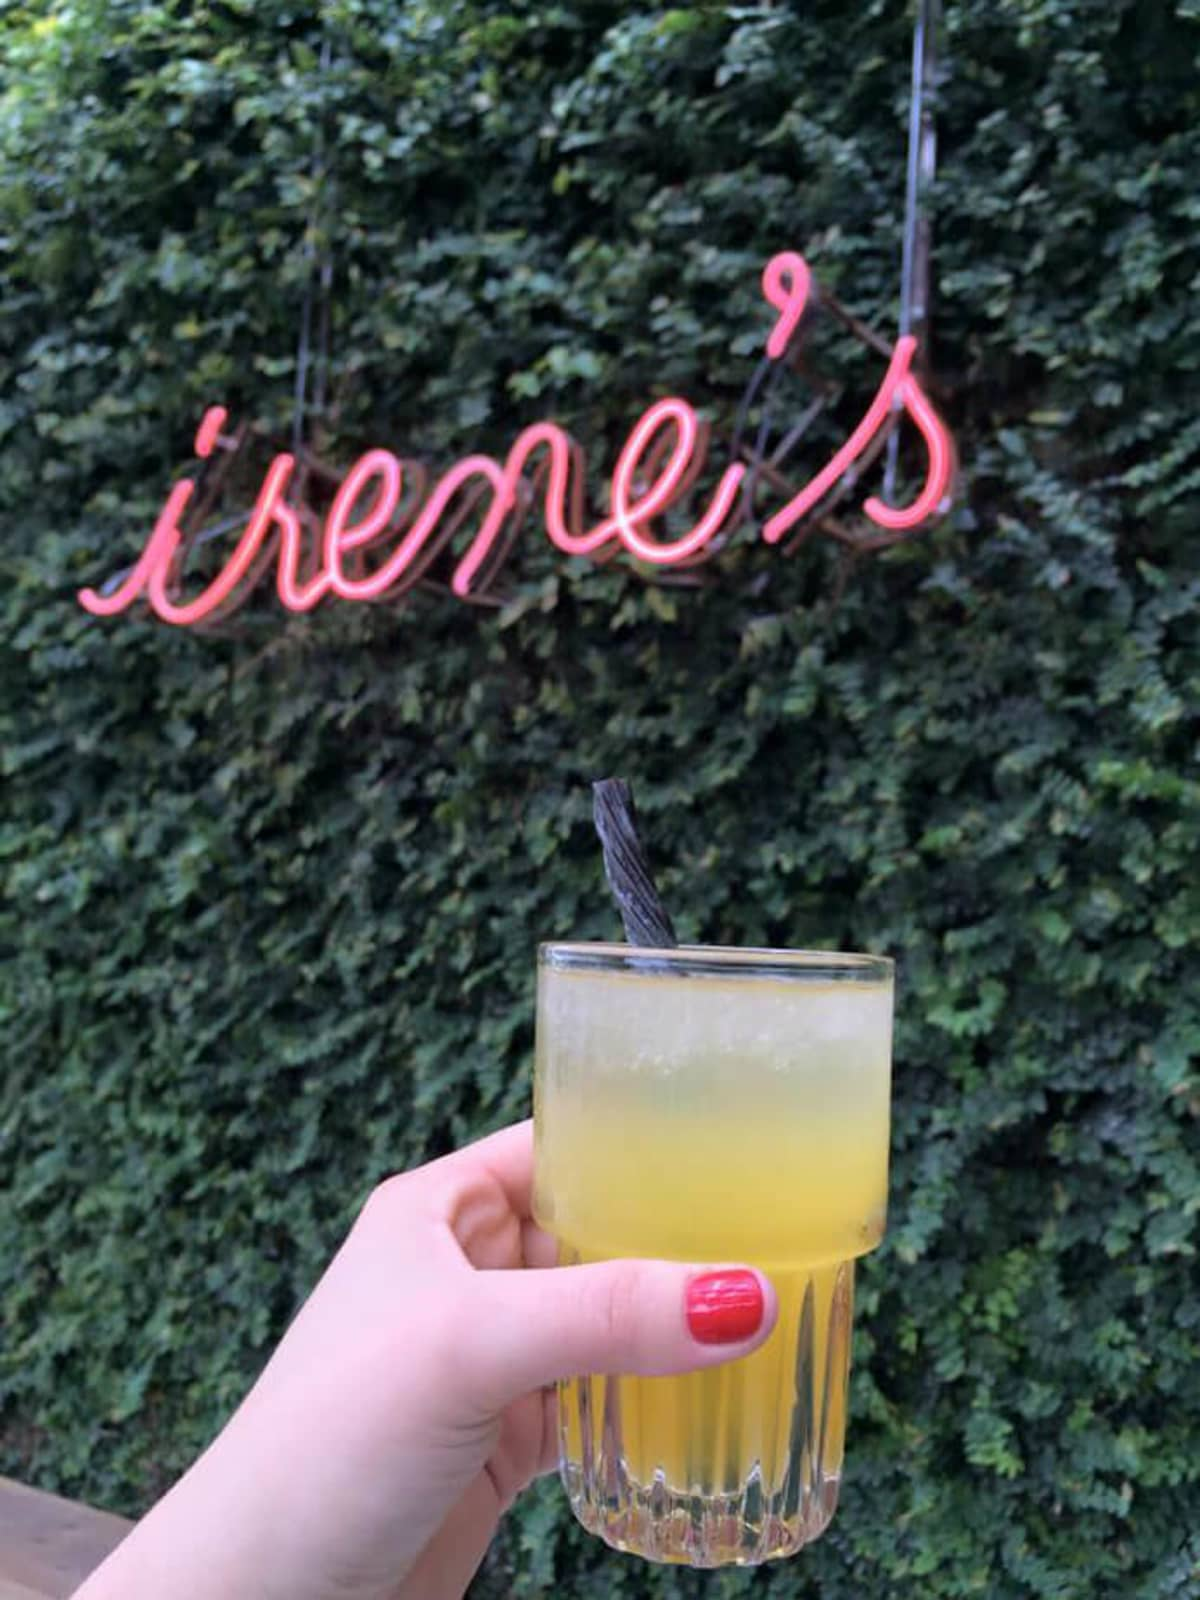 Irene's restaurant downtown Austin sign cocktail drink licorice